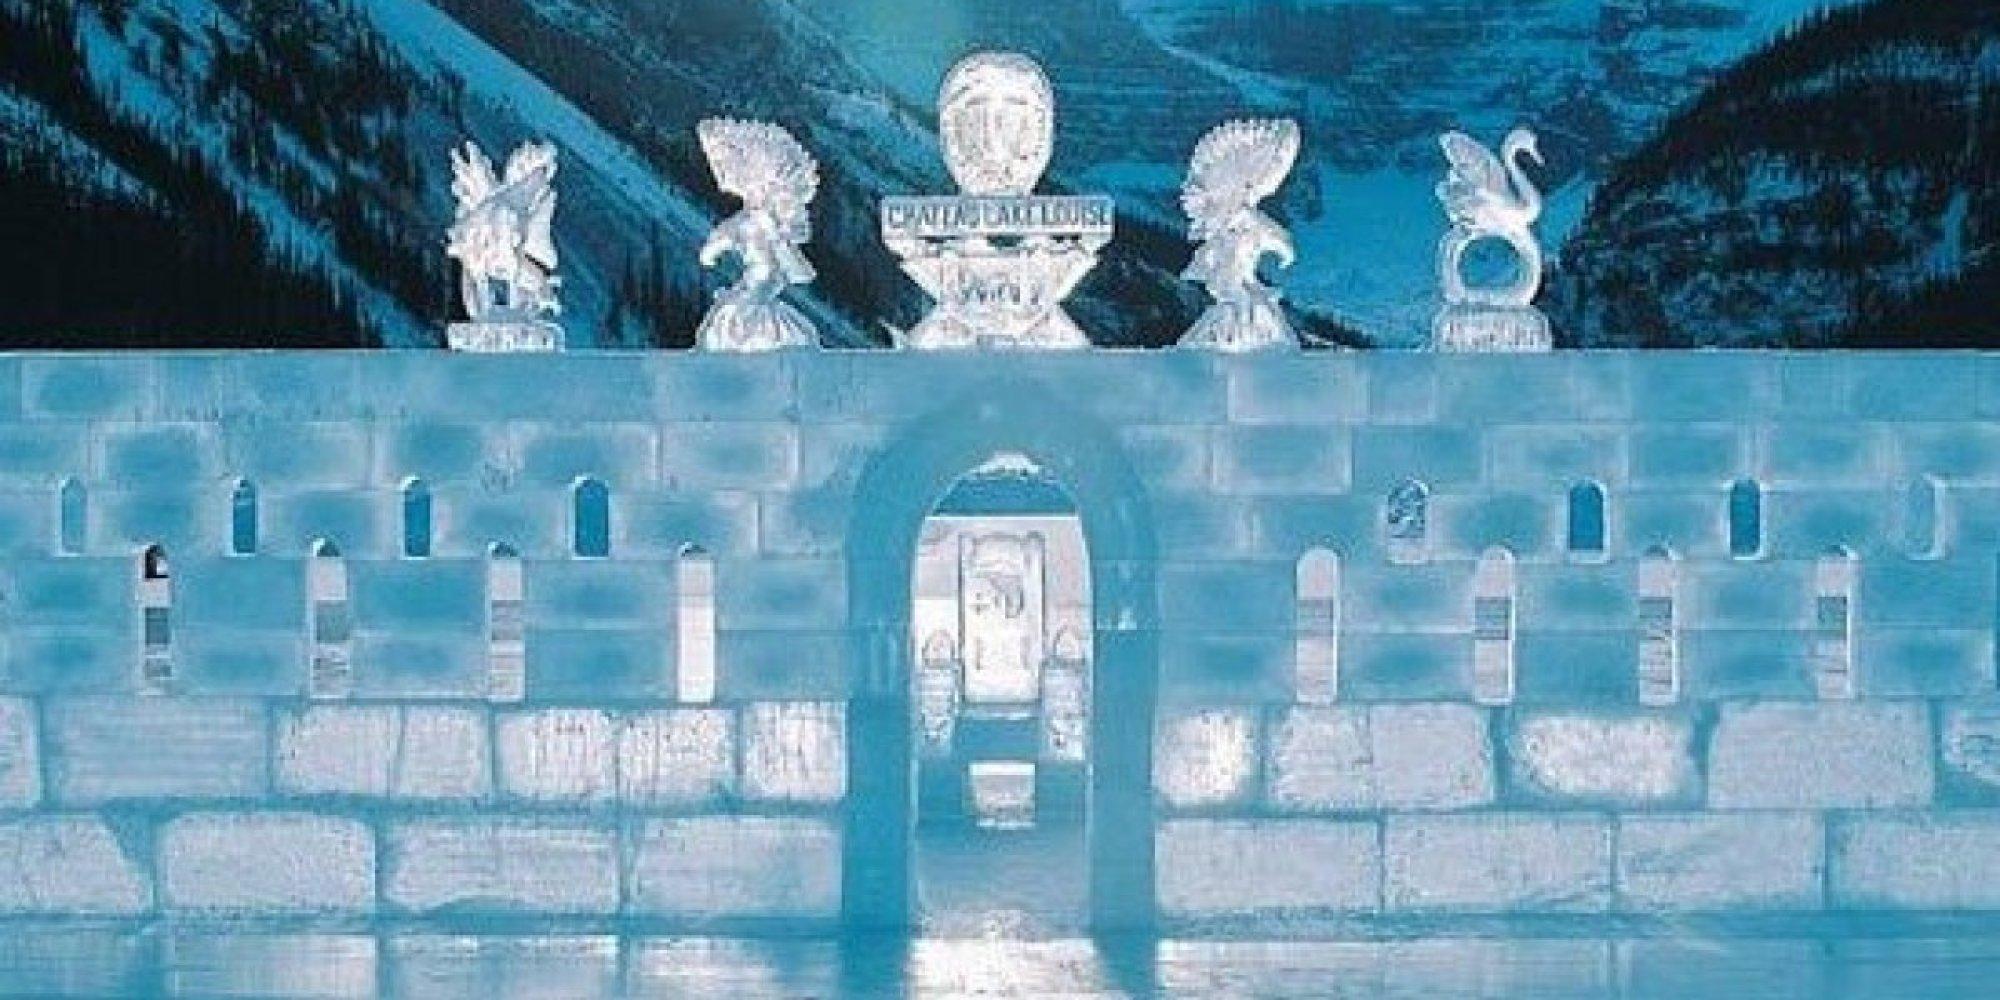 ice castle by kimesama - photo #20